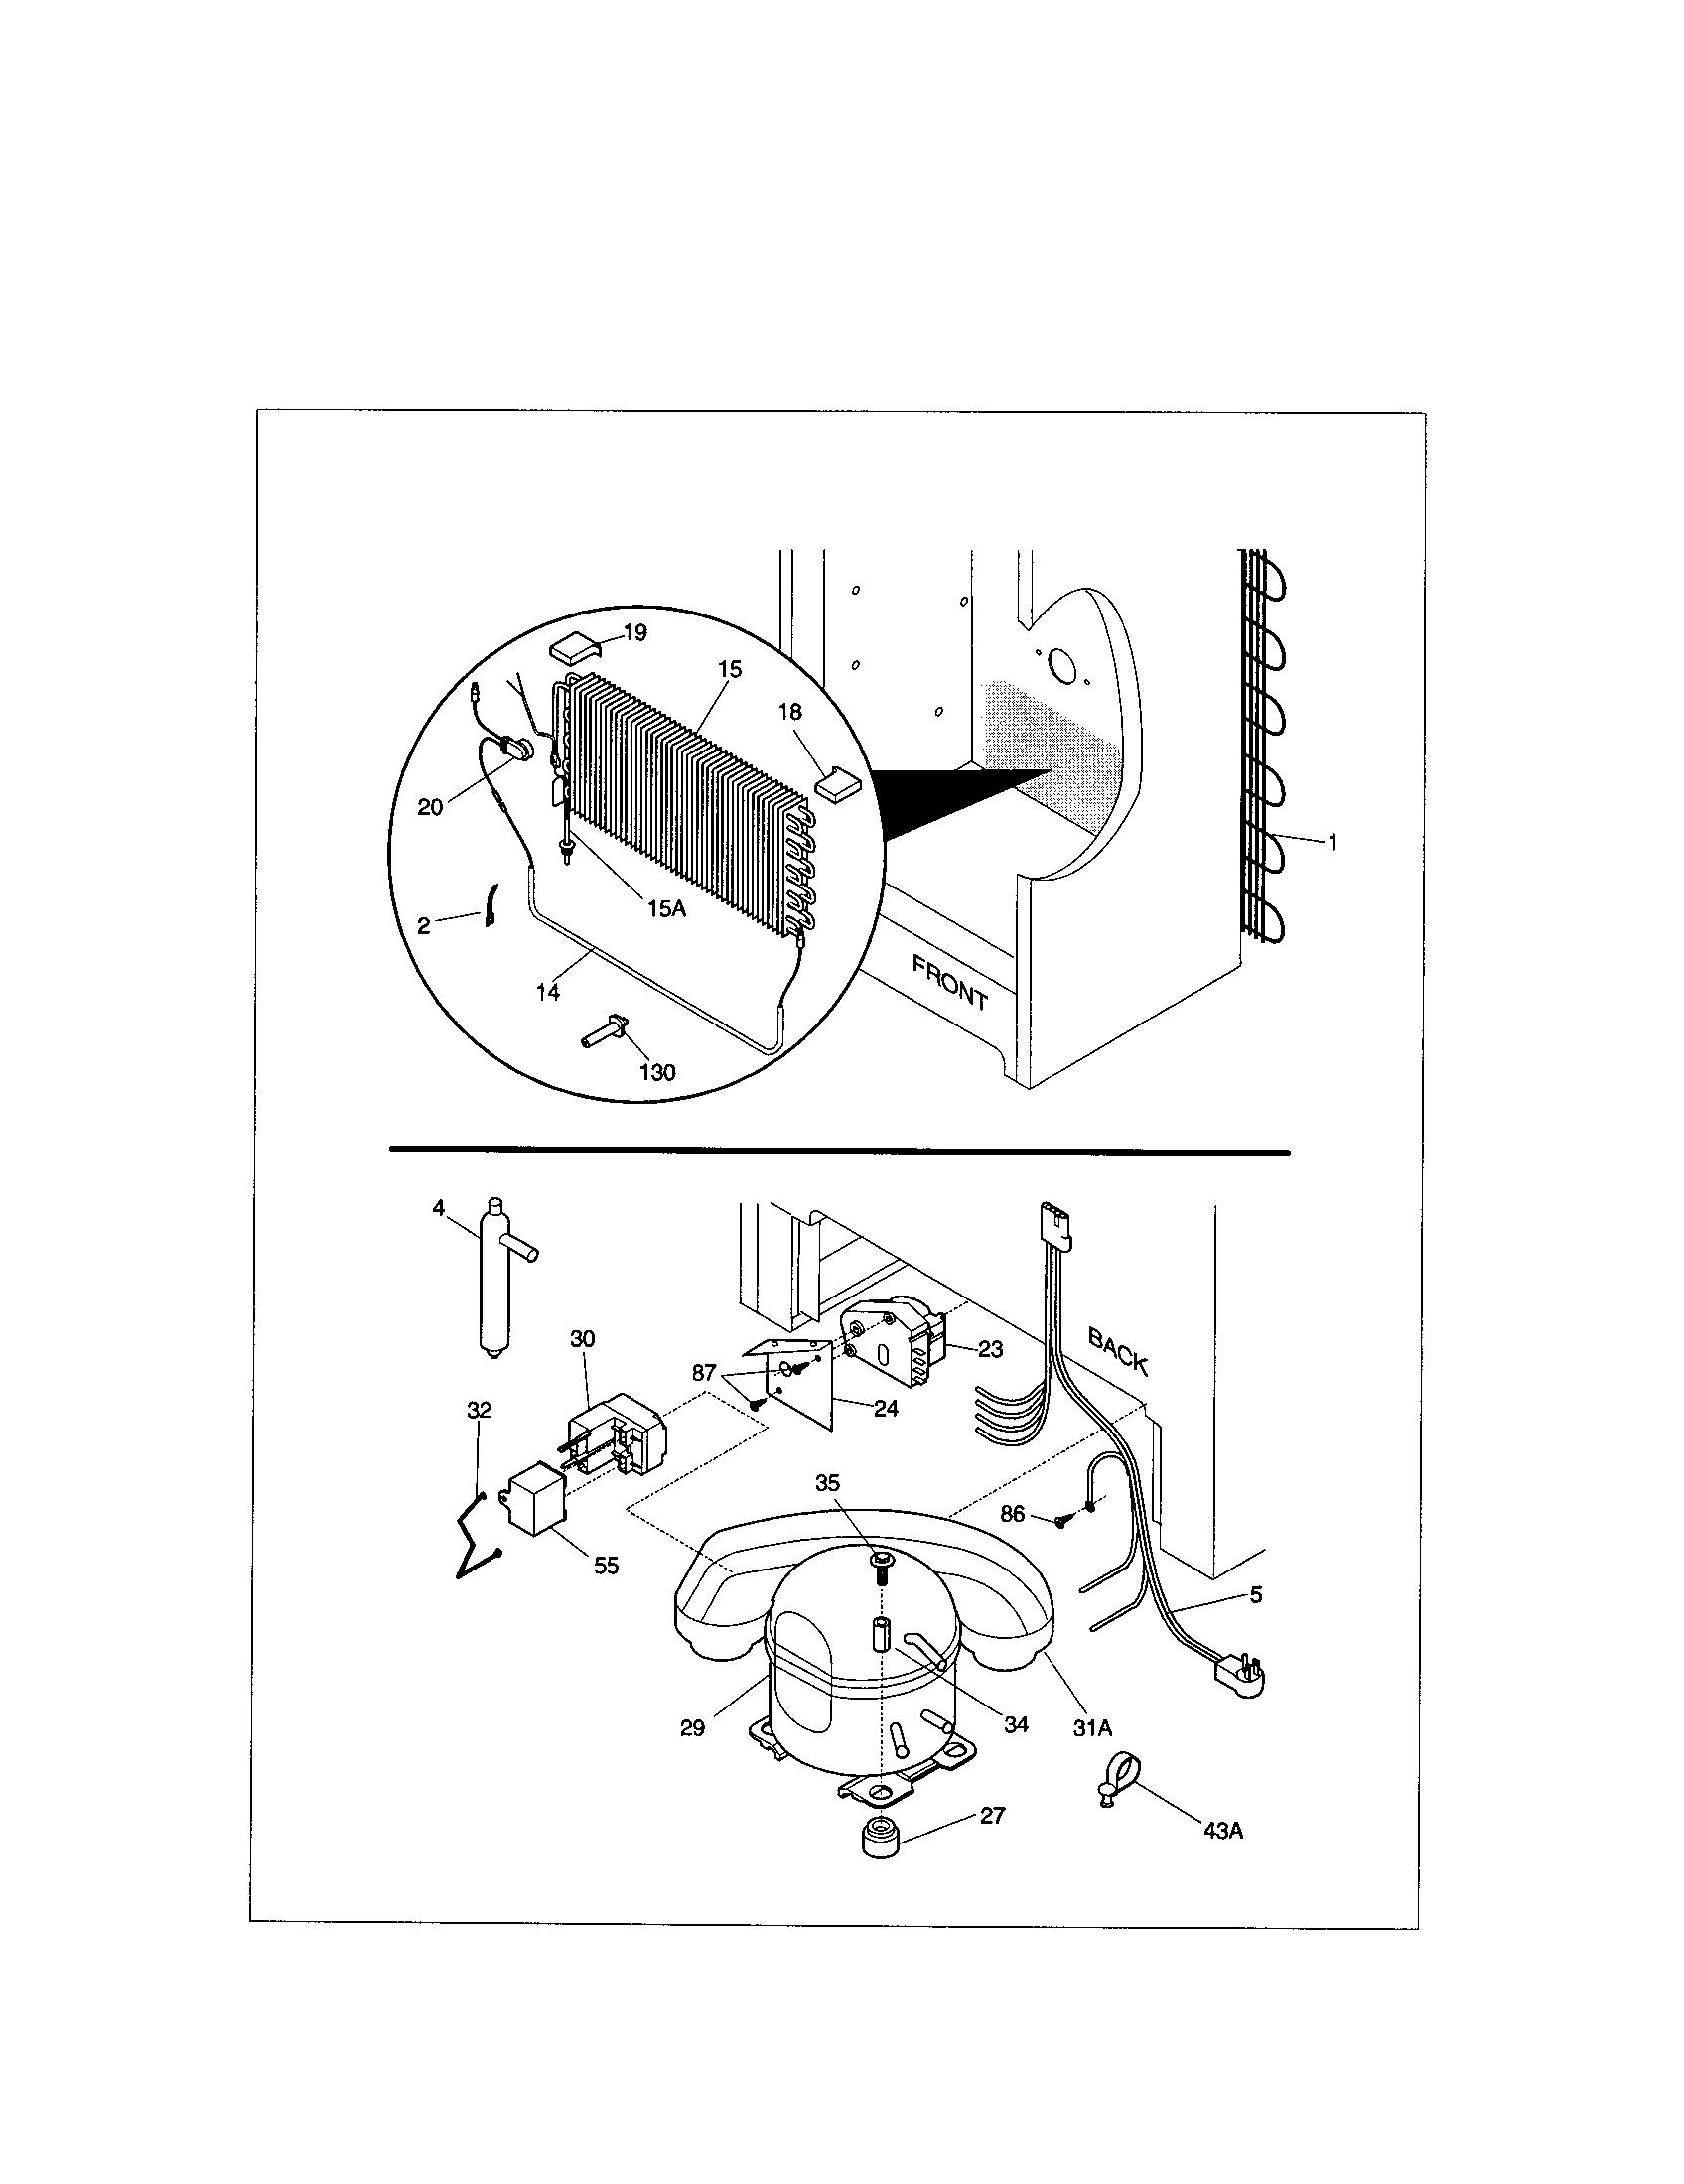 Kenmore 253 Freezer Condenser Coil